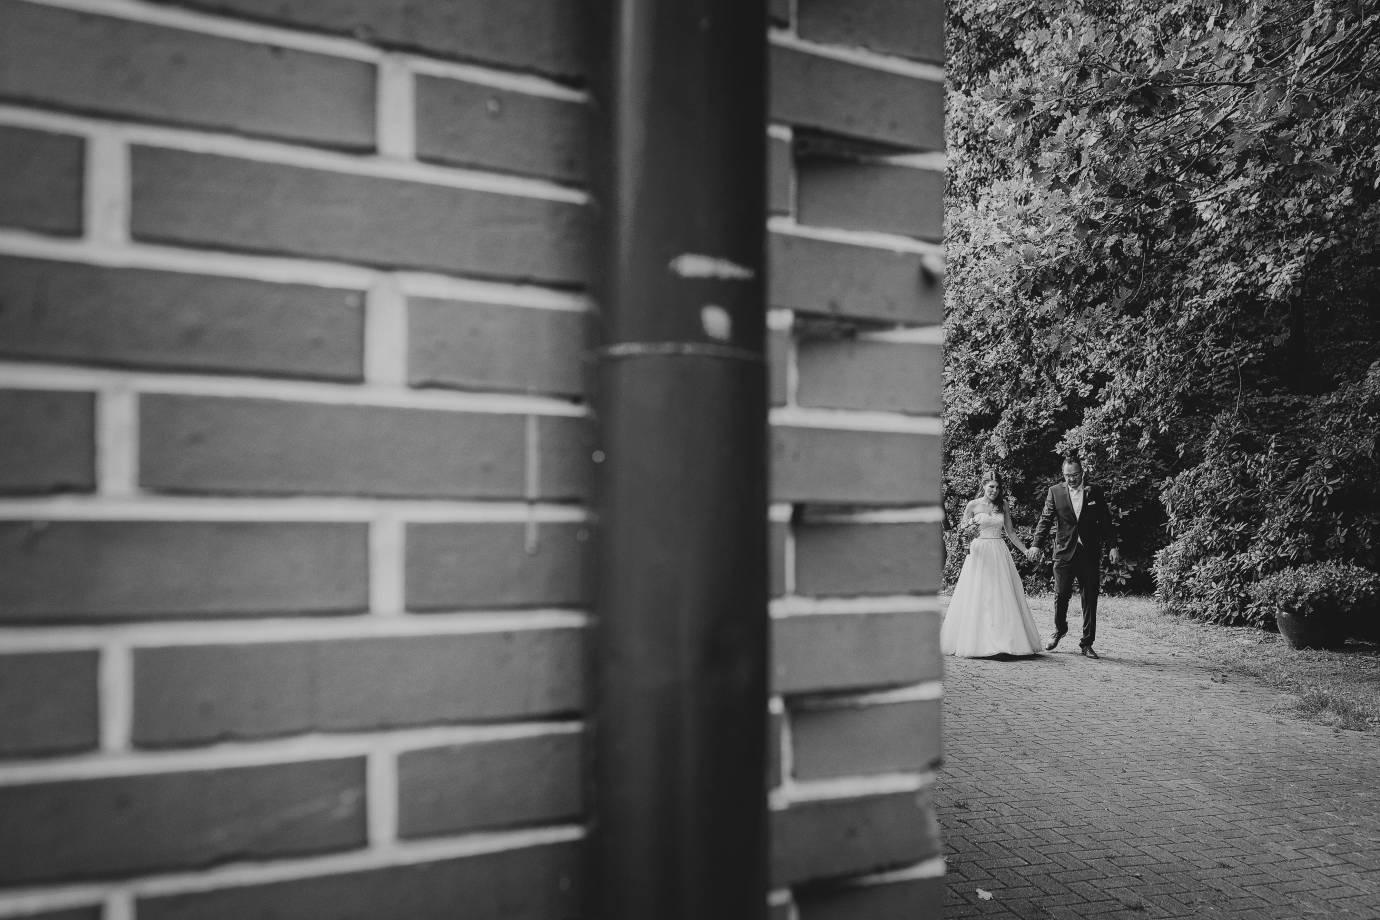 hochzeitsfotograf ganderkesee 117 - Christina+Andreas